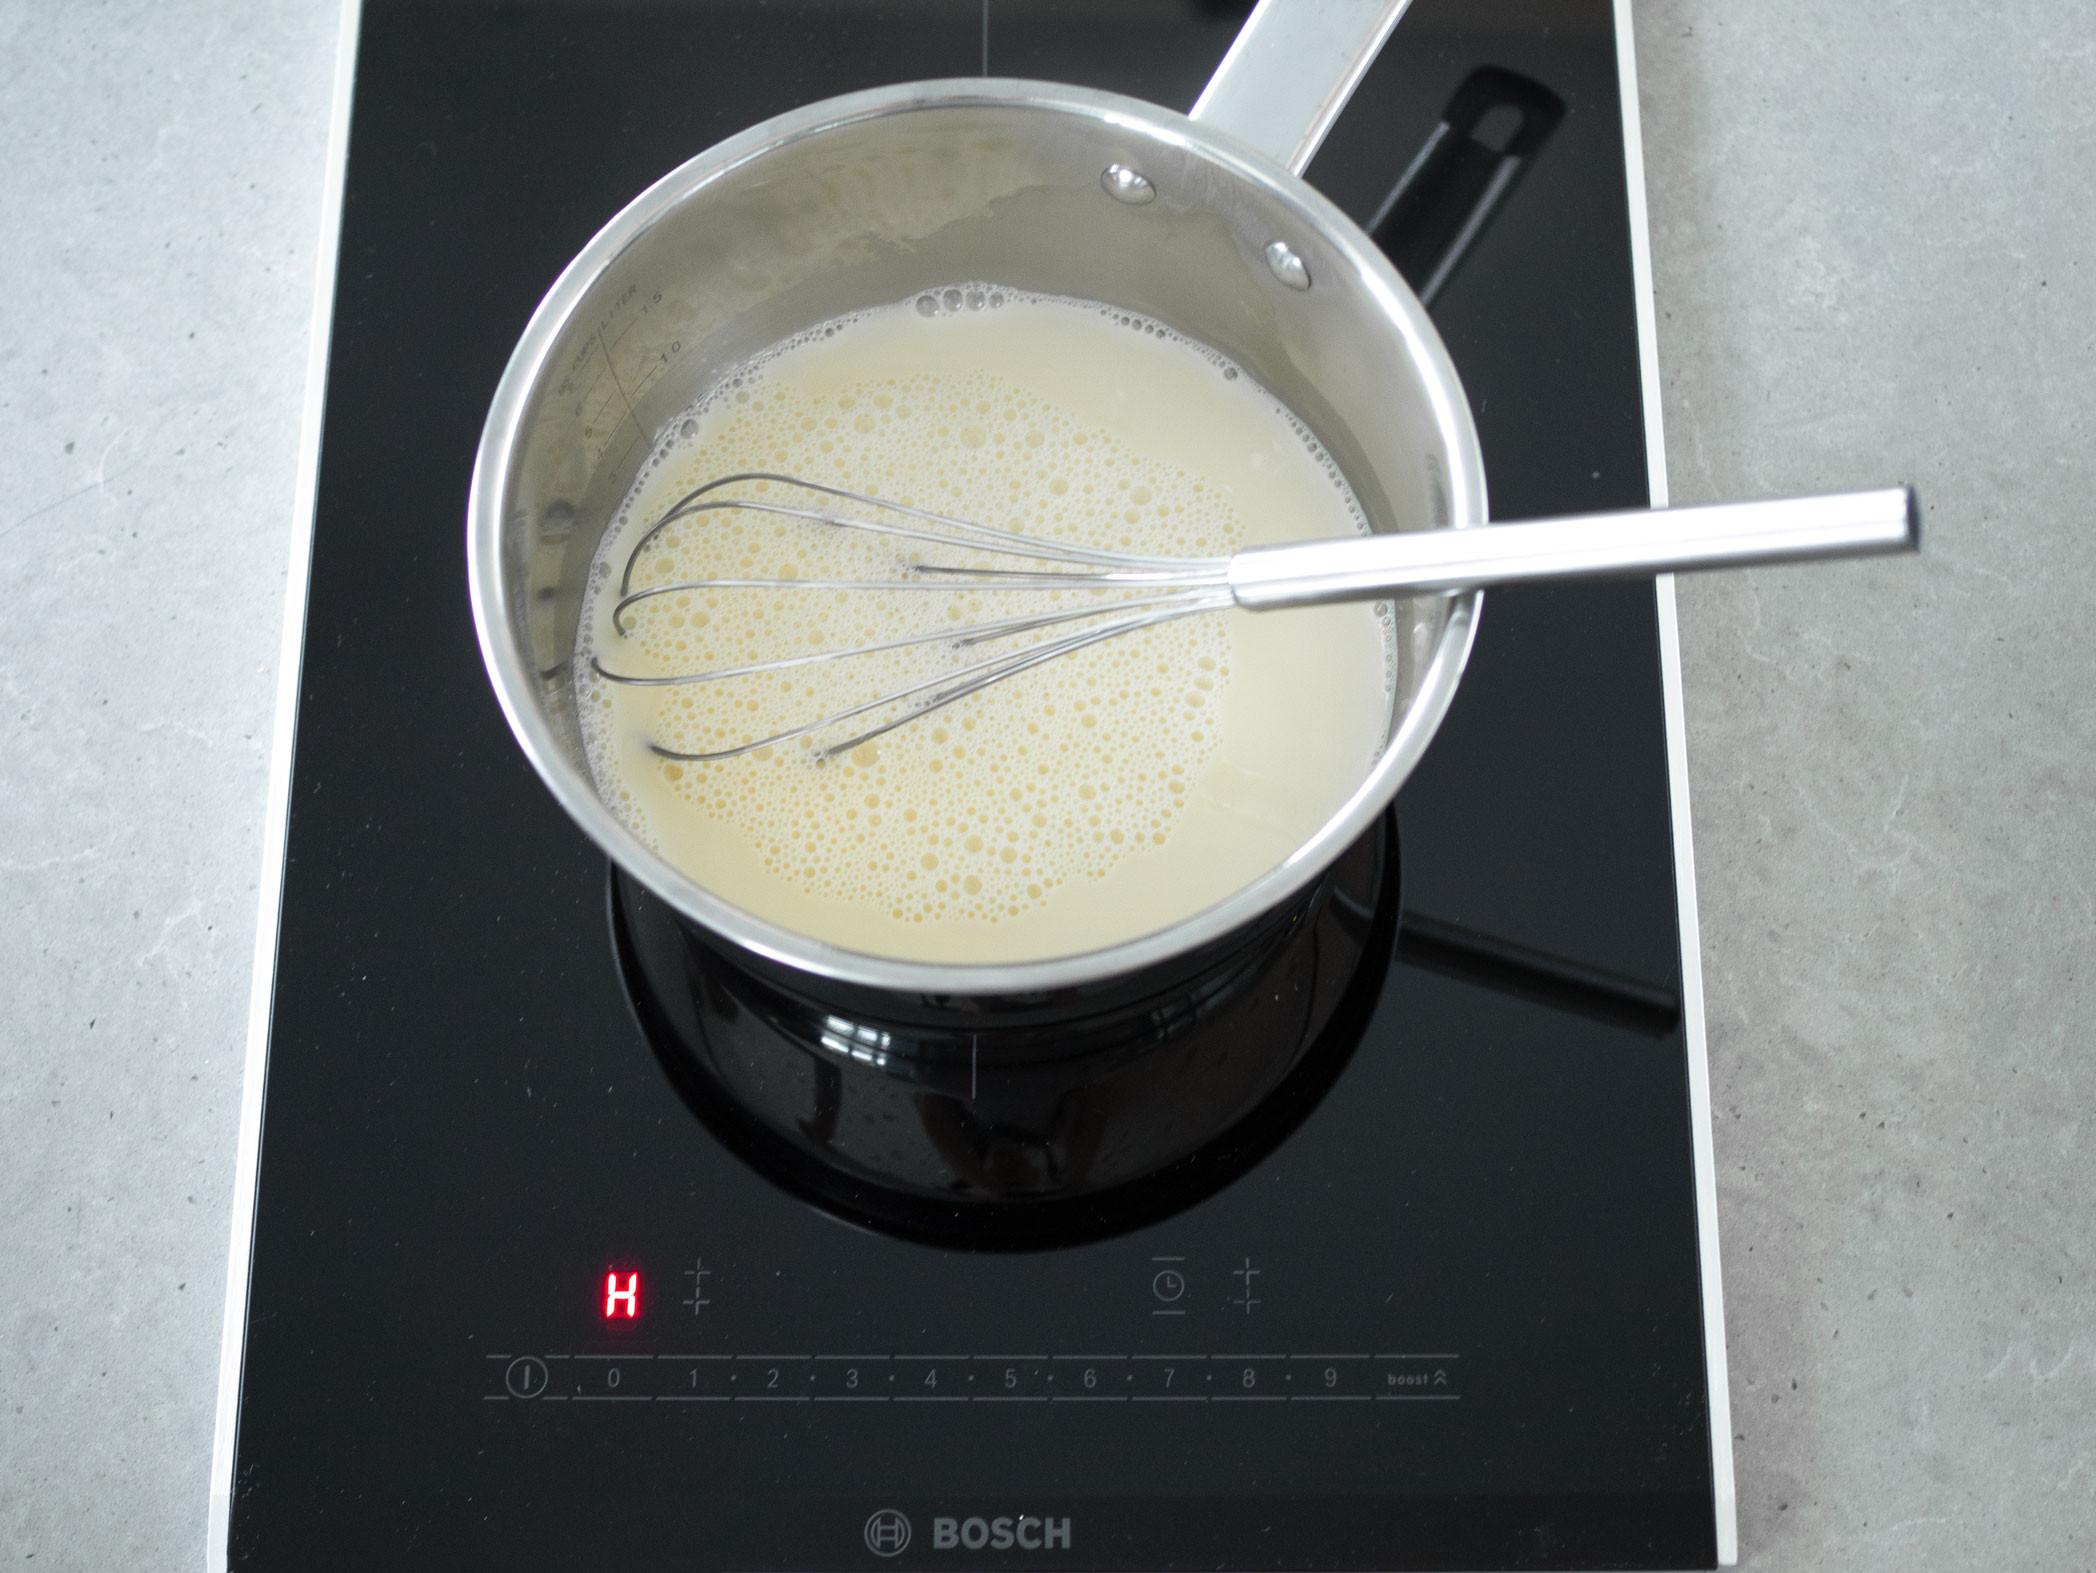 Mleko sojowe w garnku.